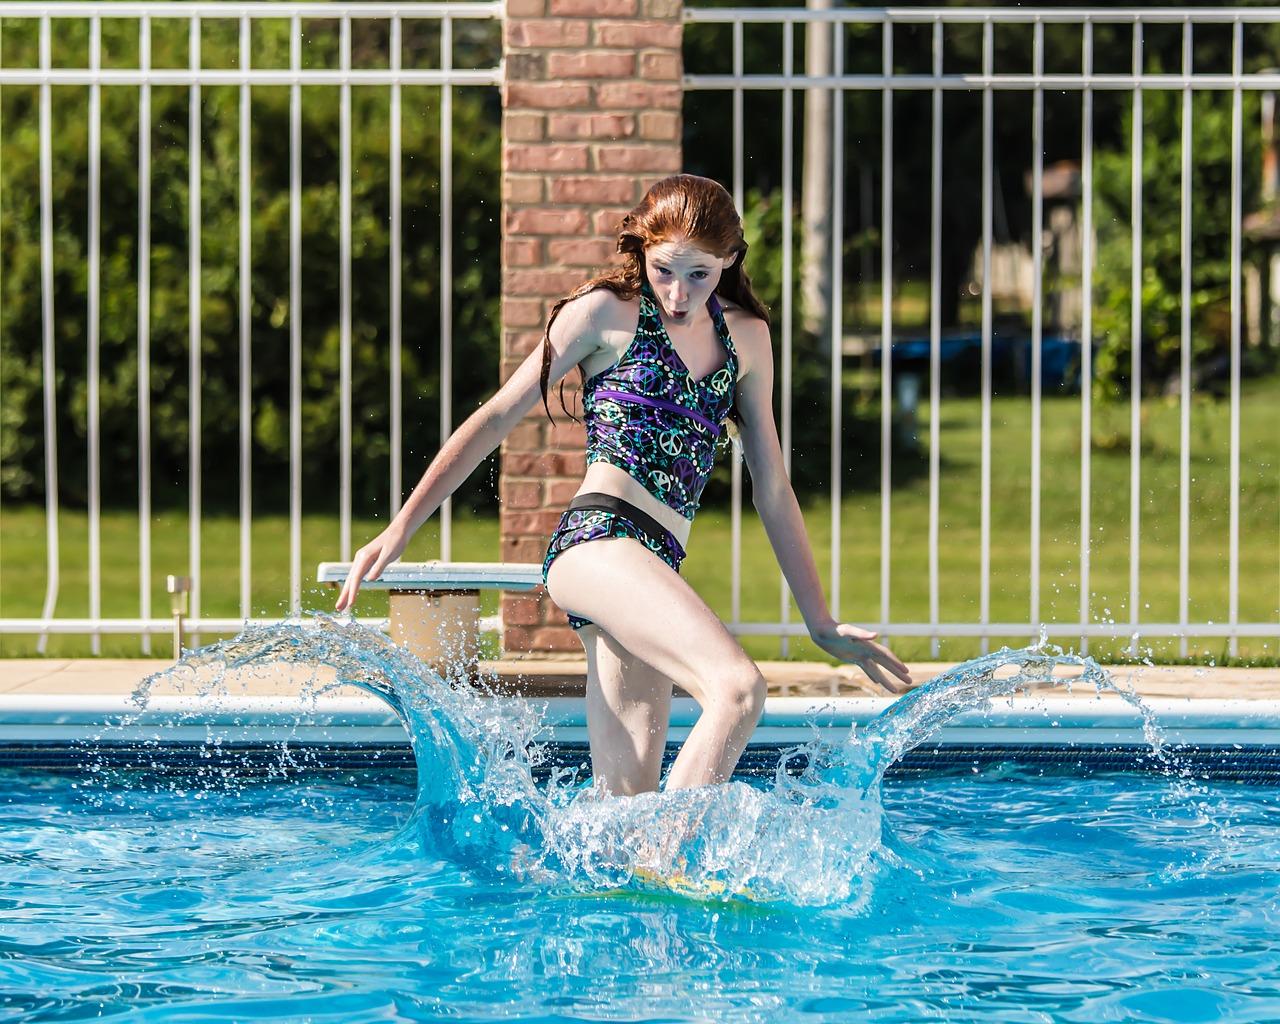 Femdom at swimming pool